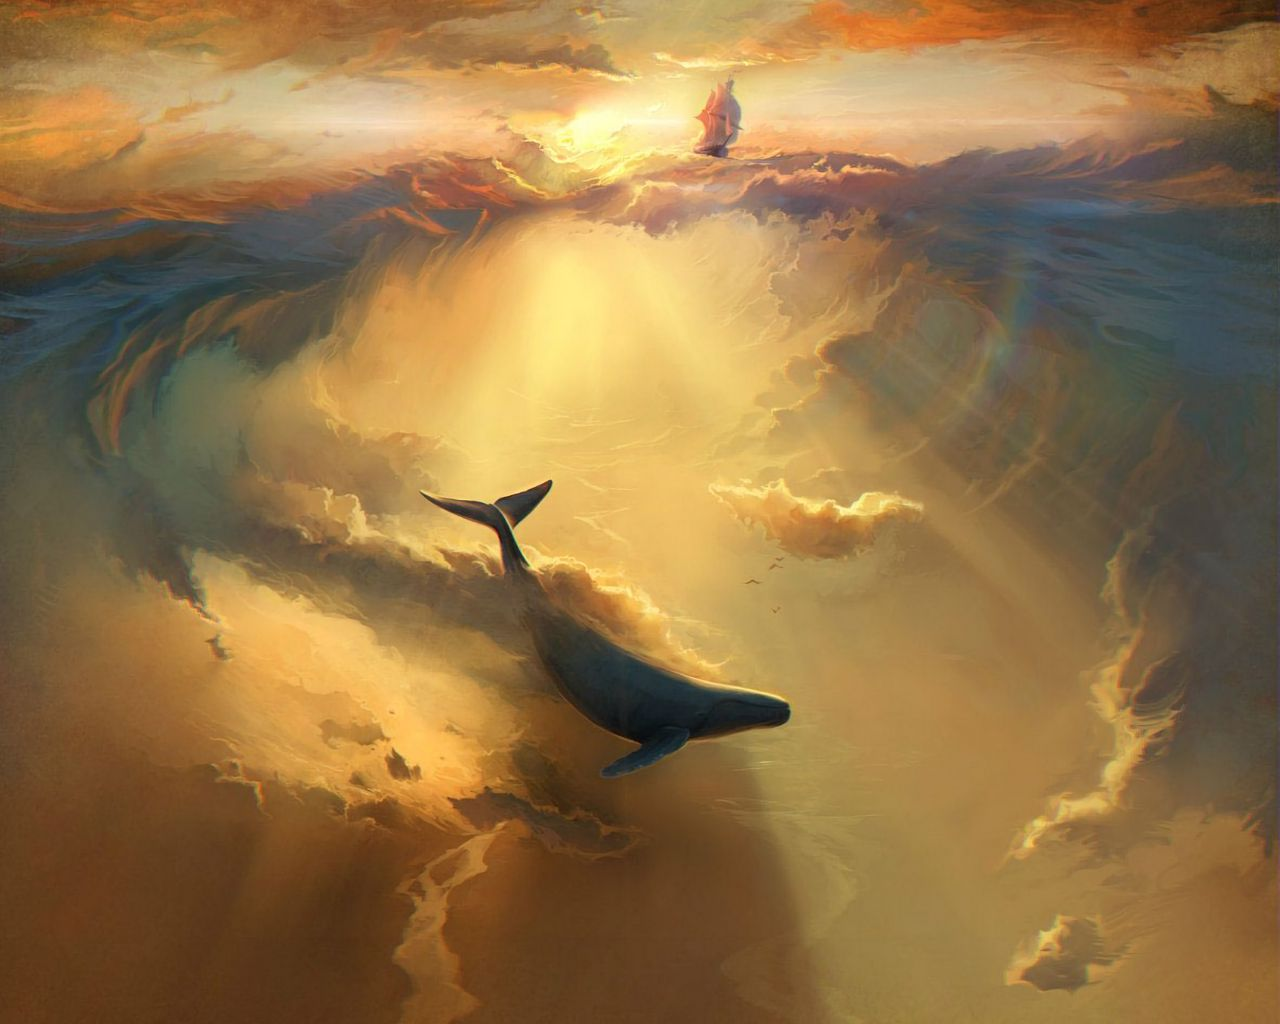 1280x1024 Wallpaper shark, dolphin, sea, art, underwater world